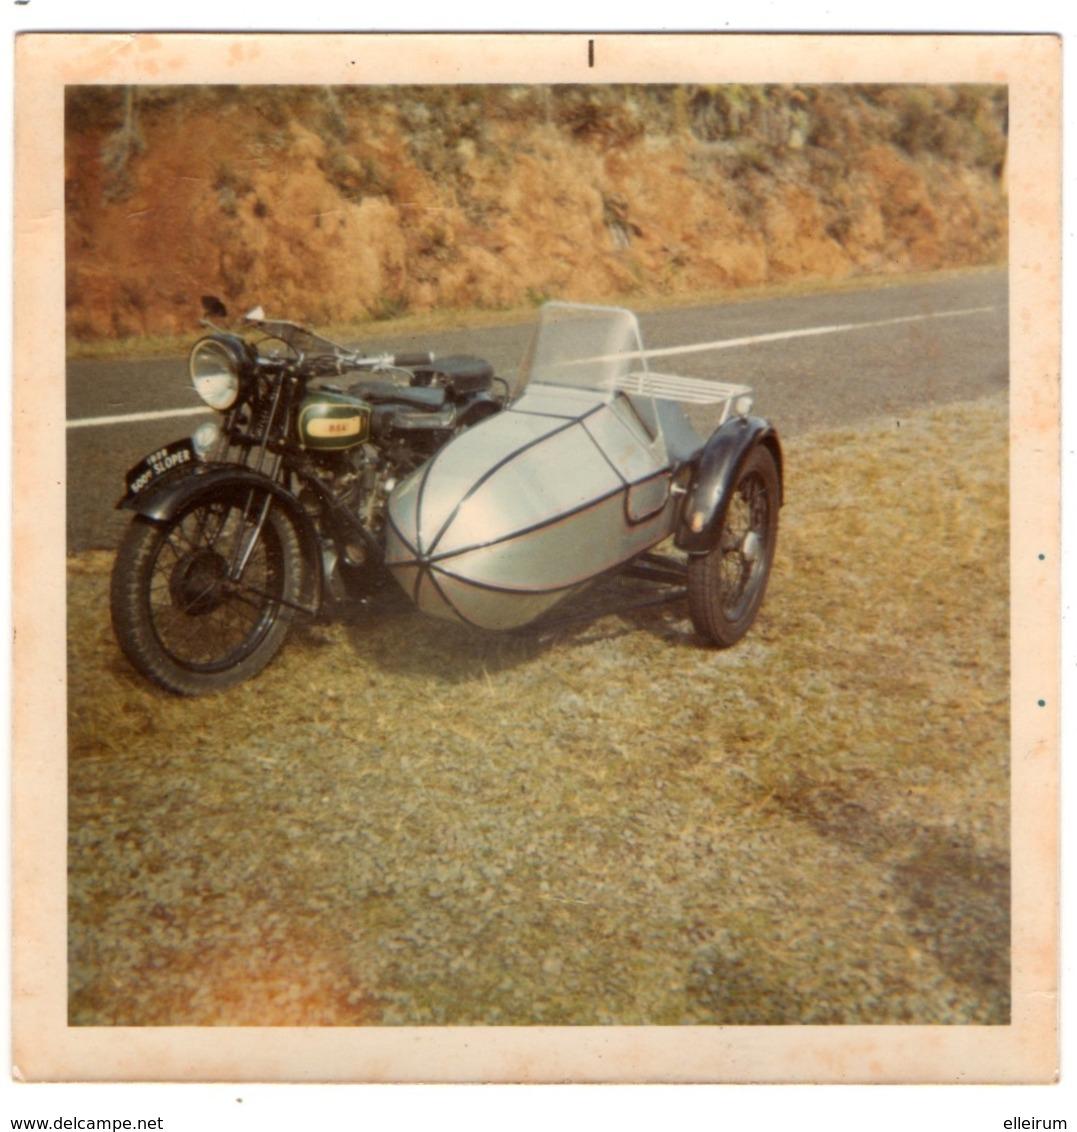 PHOTO. MOTO B.S.A. SLOPER 500 Cm3 1928. - Automobiles